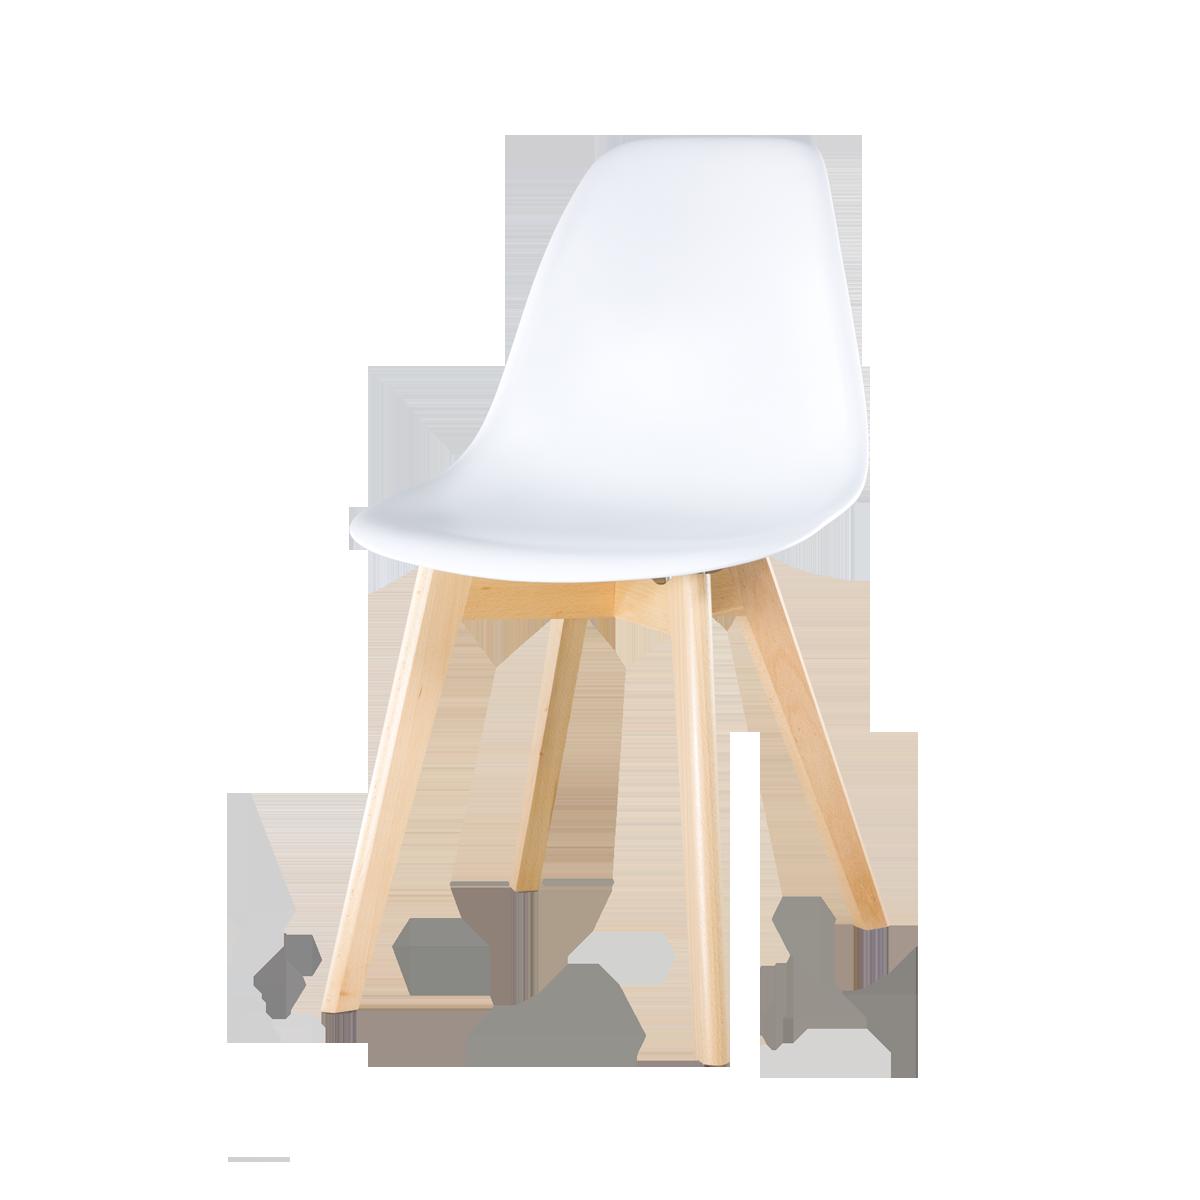 design stuhl plastik stunning plastik stuhl husliche auf amazonde fr with design stuhl plastik. Black Bedroom Furniture Sets. Home Design Ideas